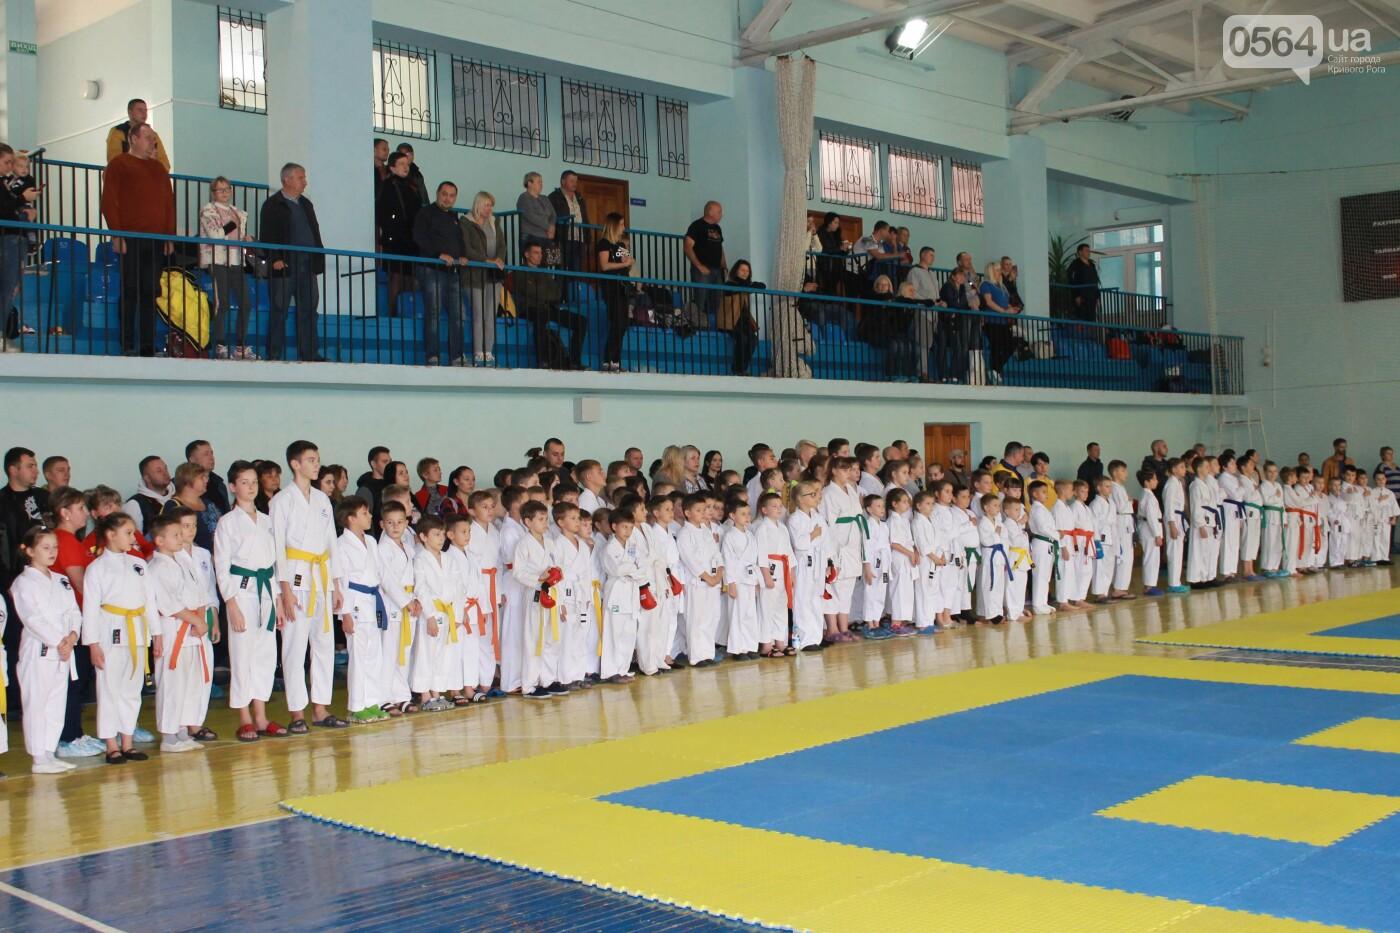 Криворожане завоевали областной Кубок по фунакоши шотокан каратэ, - ФОТО , фото-4